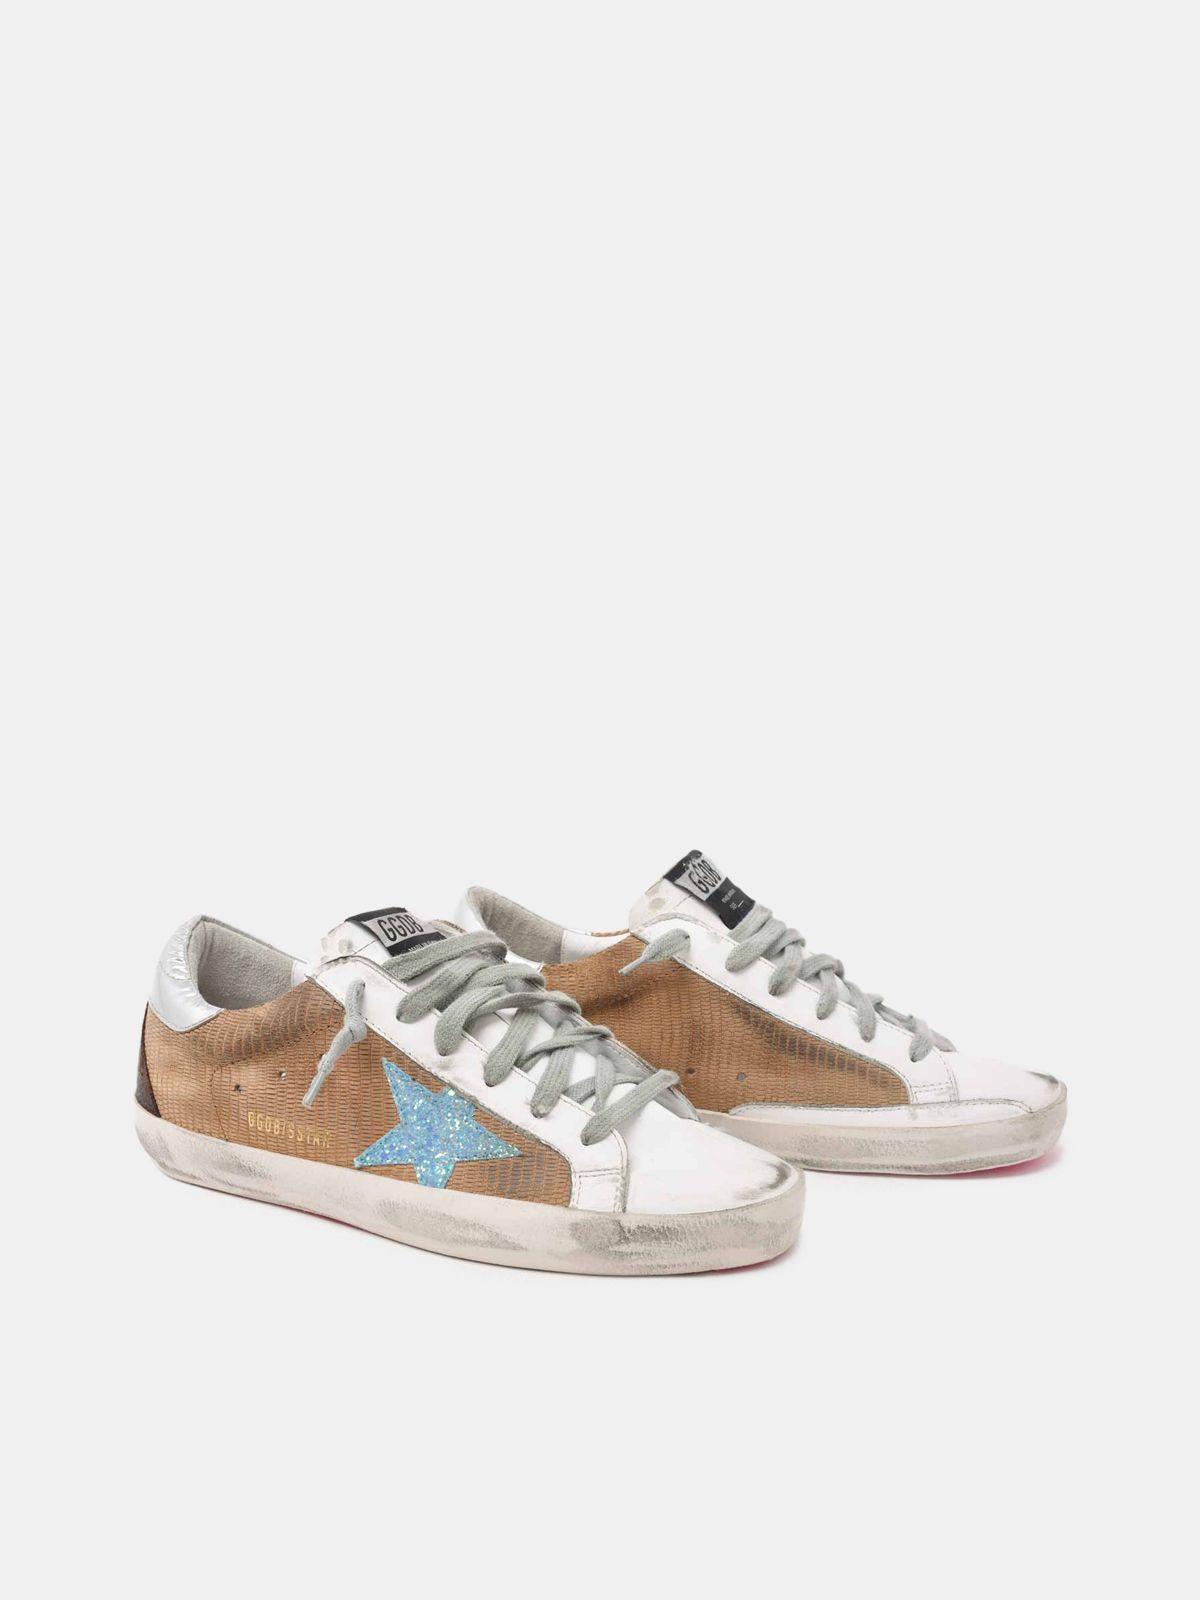 Golden Goose - Sneakers Super- Star in pelle lucertolina e stella glitter in